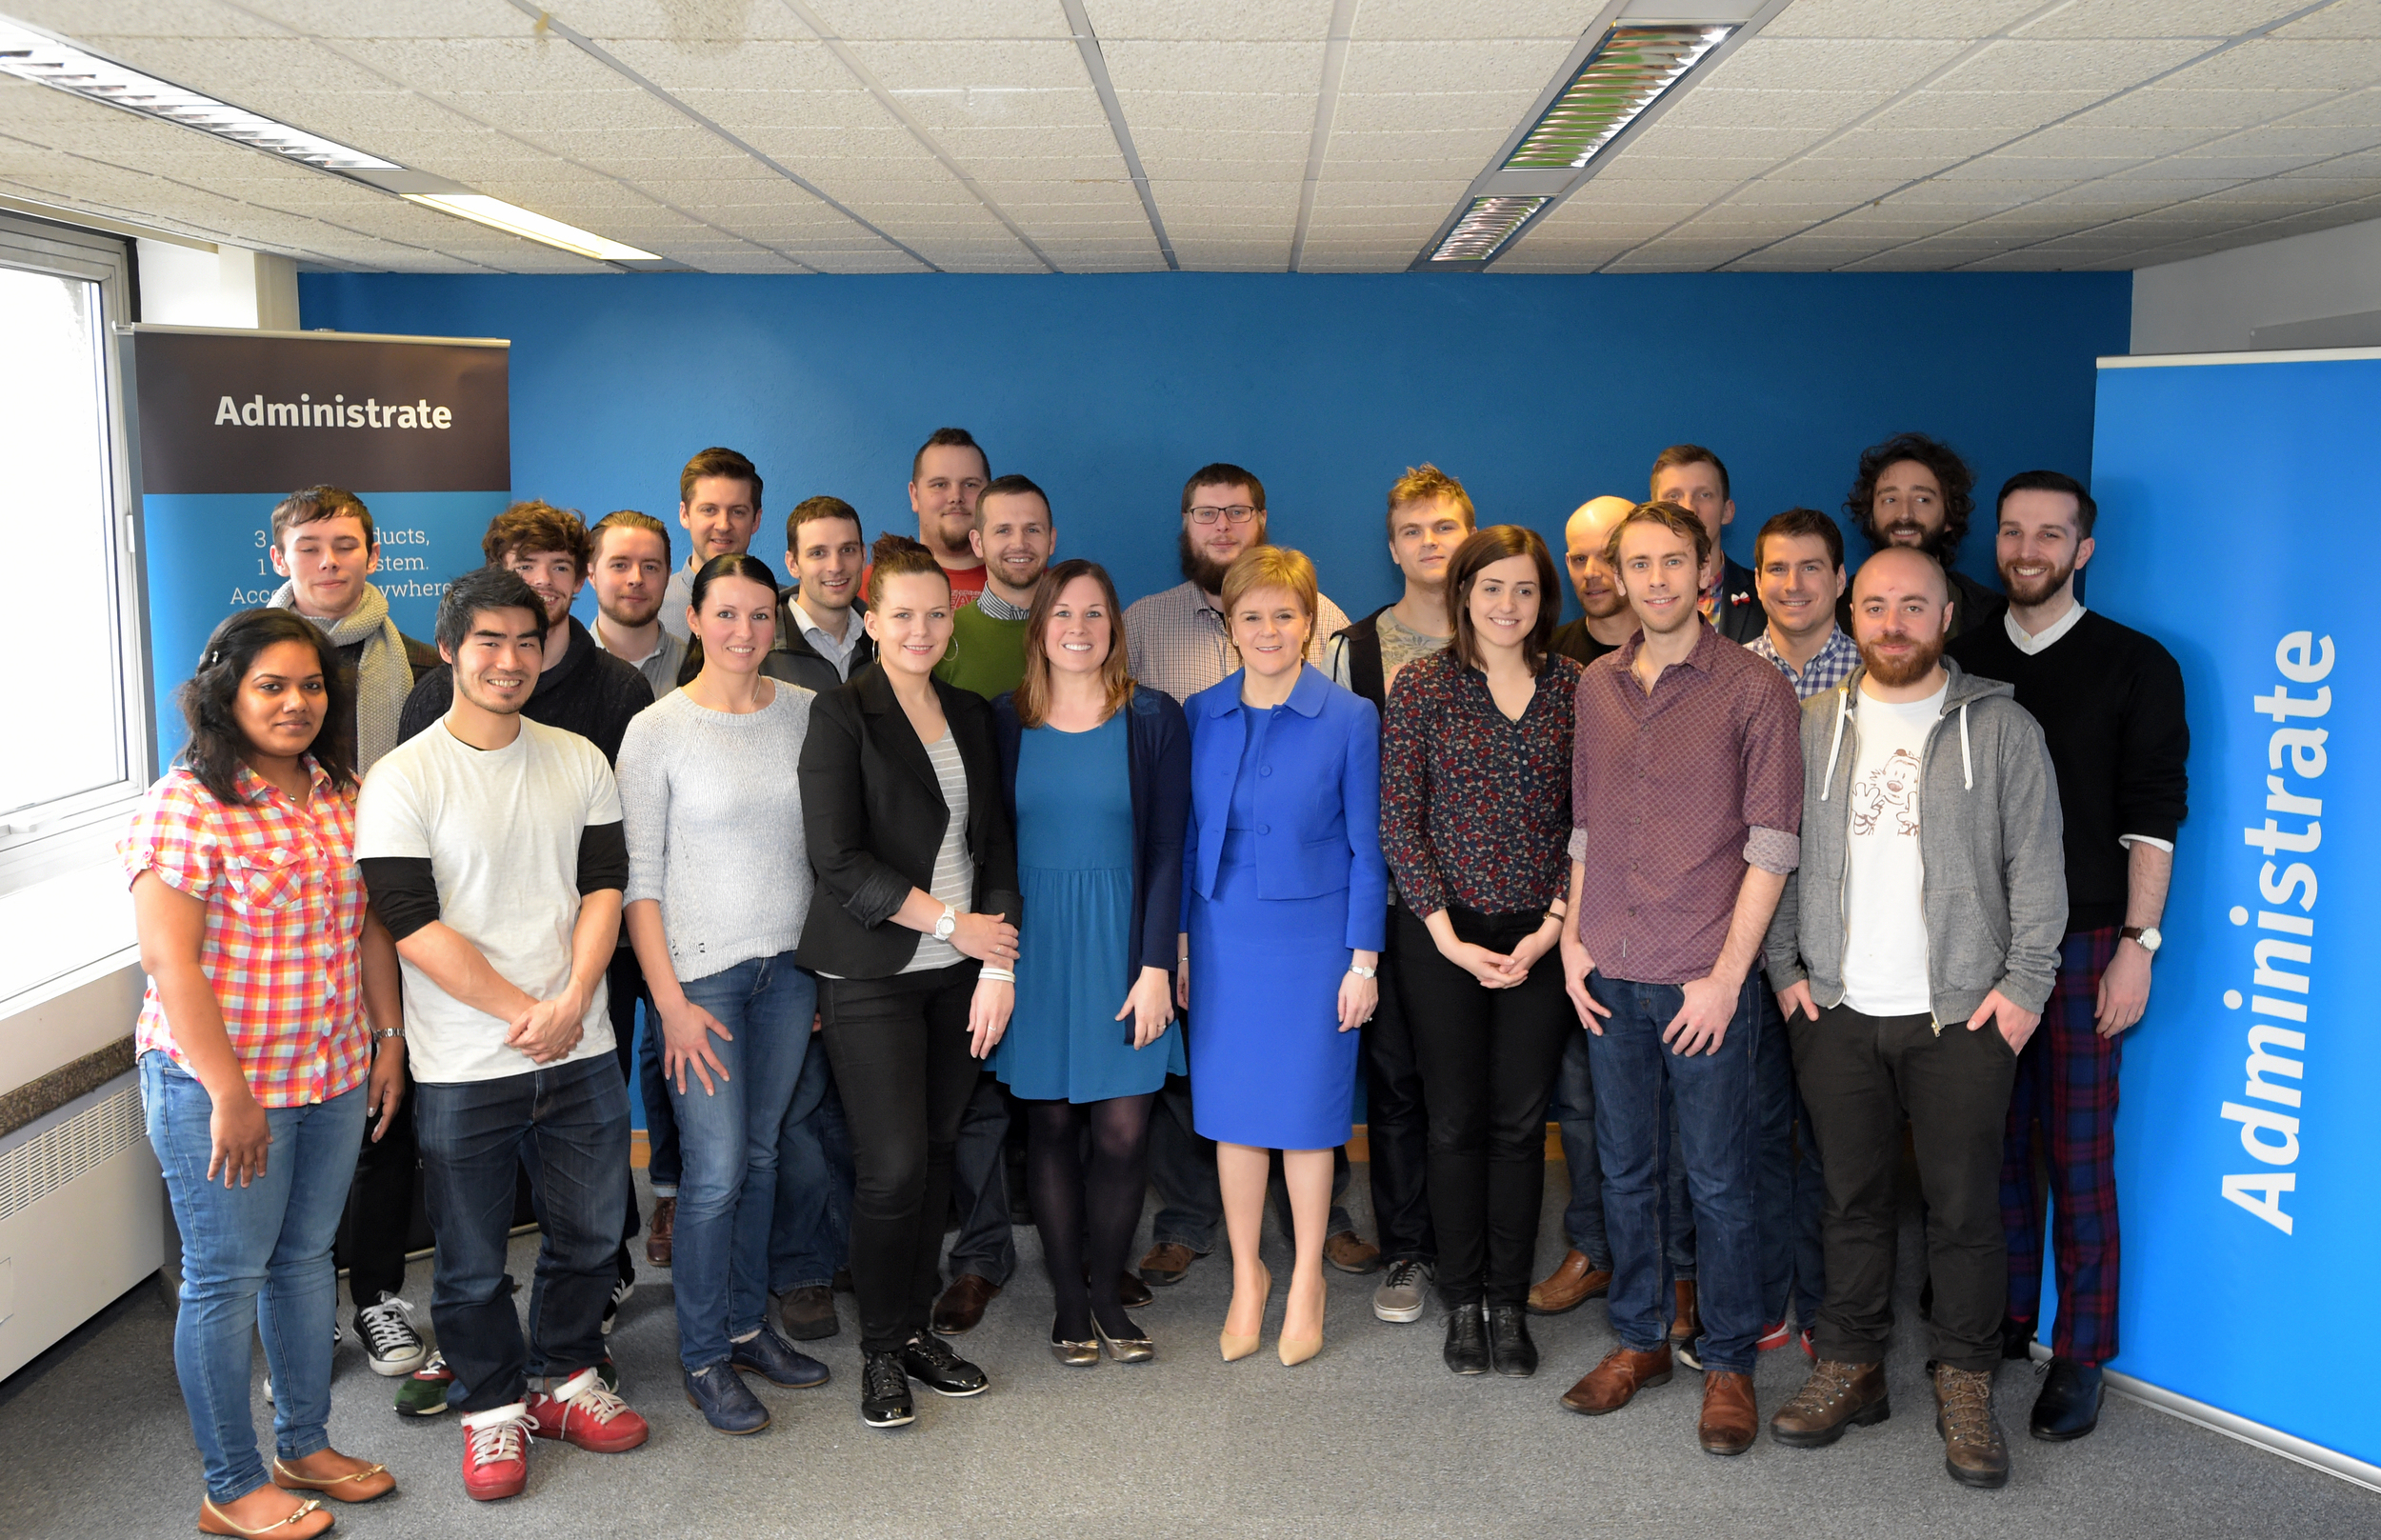 Nicola Sturgeon and team Administrate